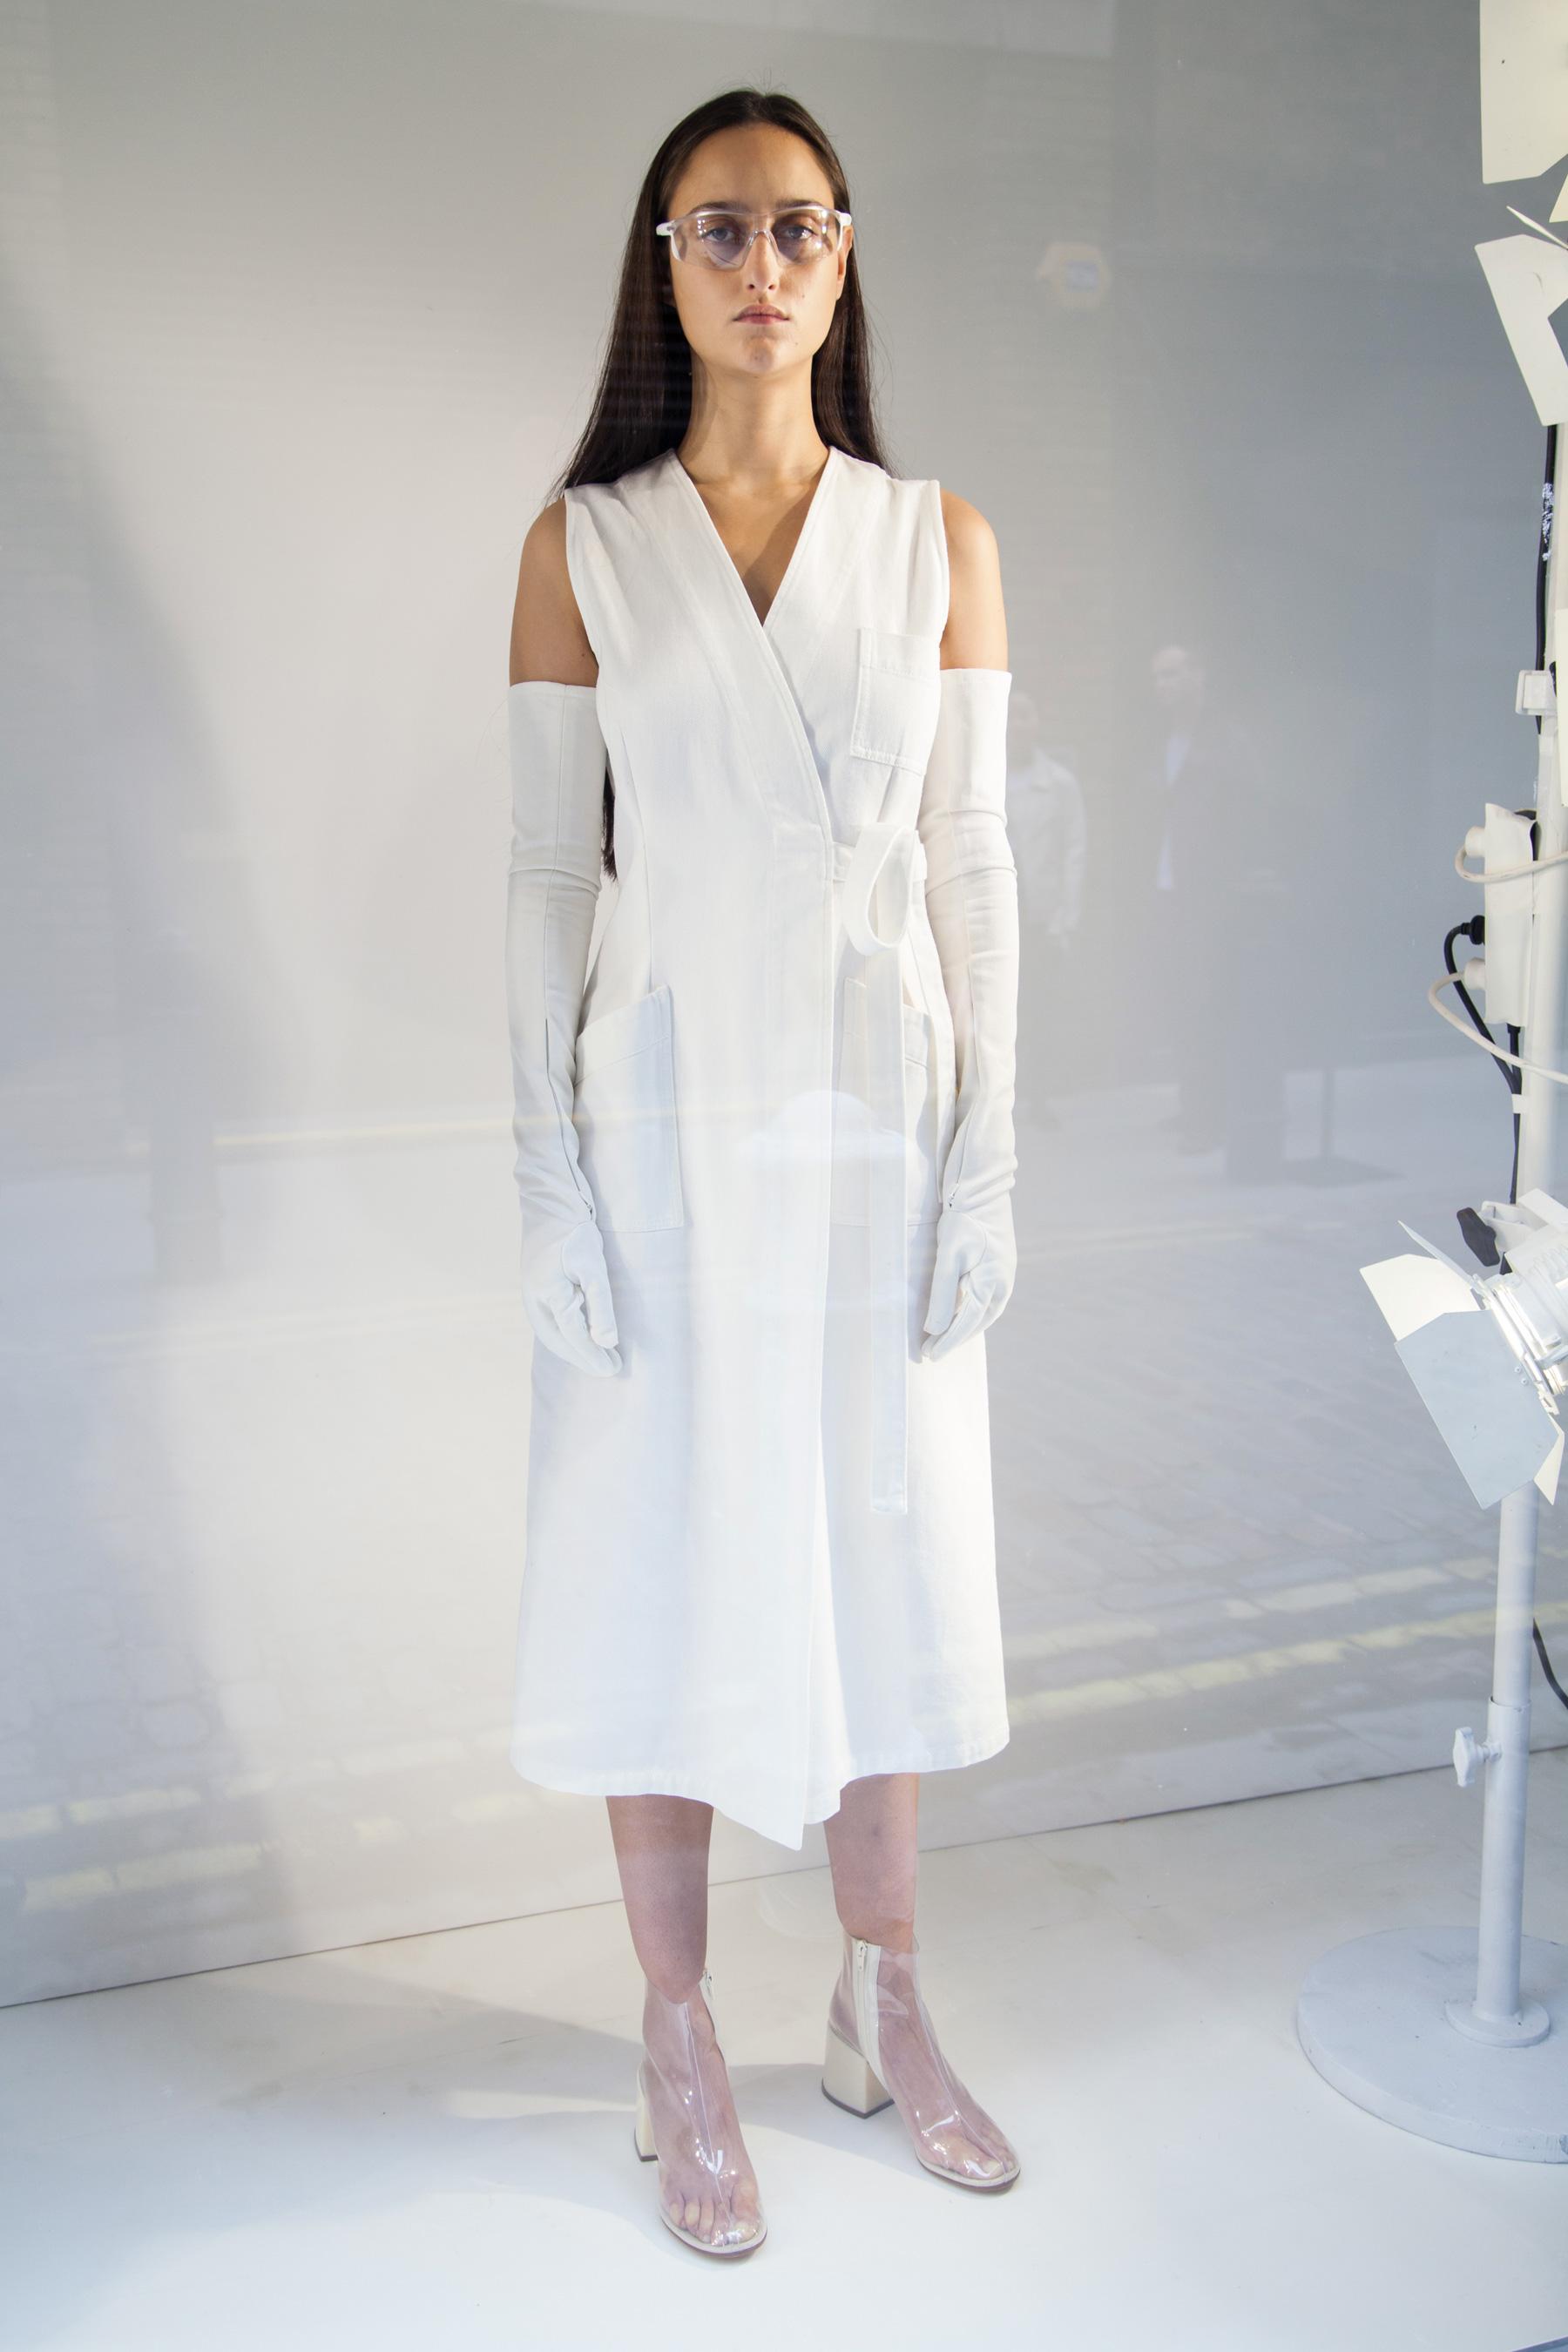 Mode robe maison 2018